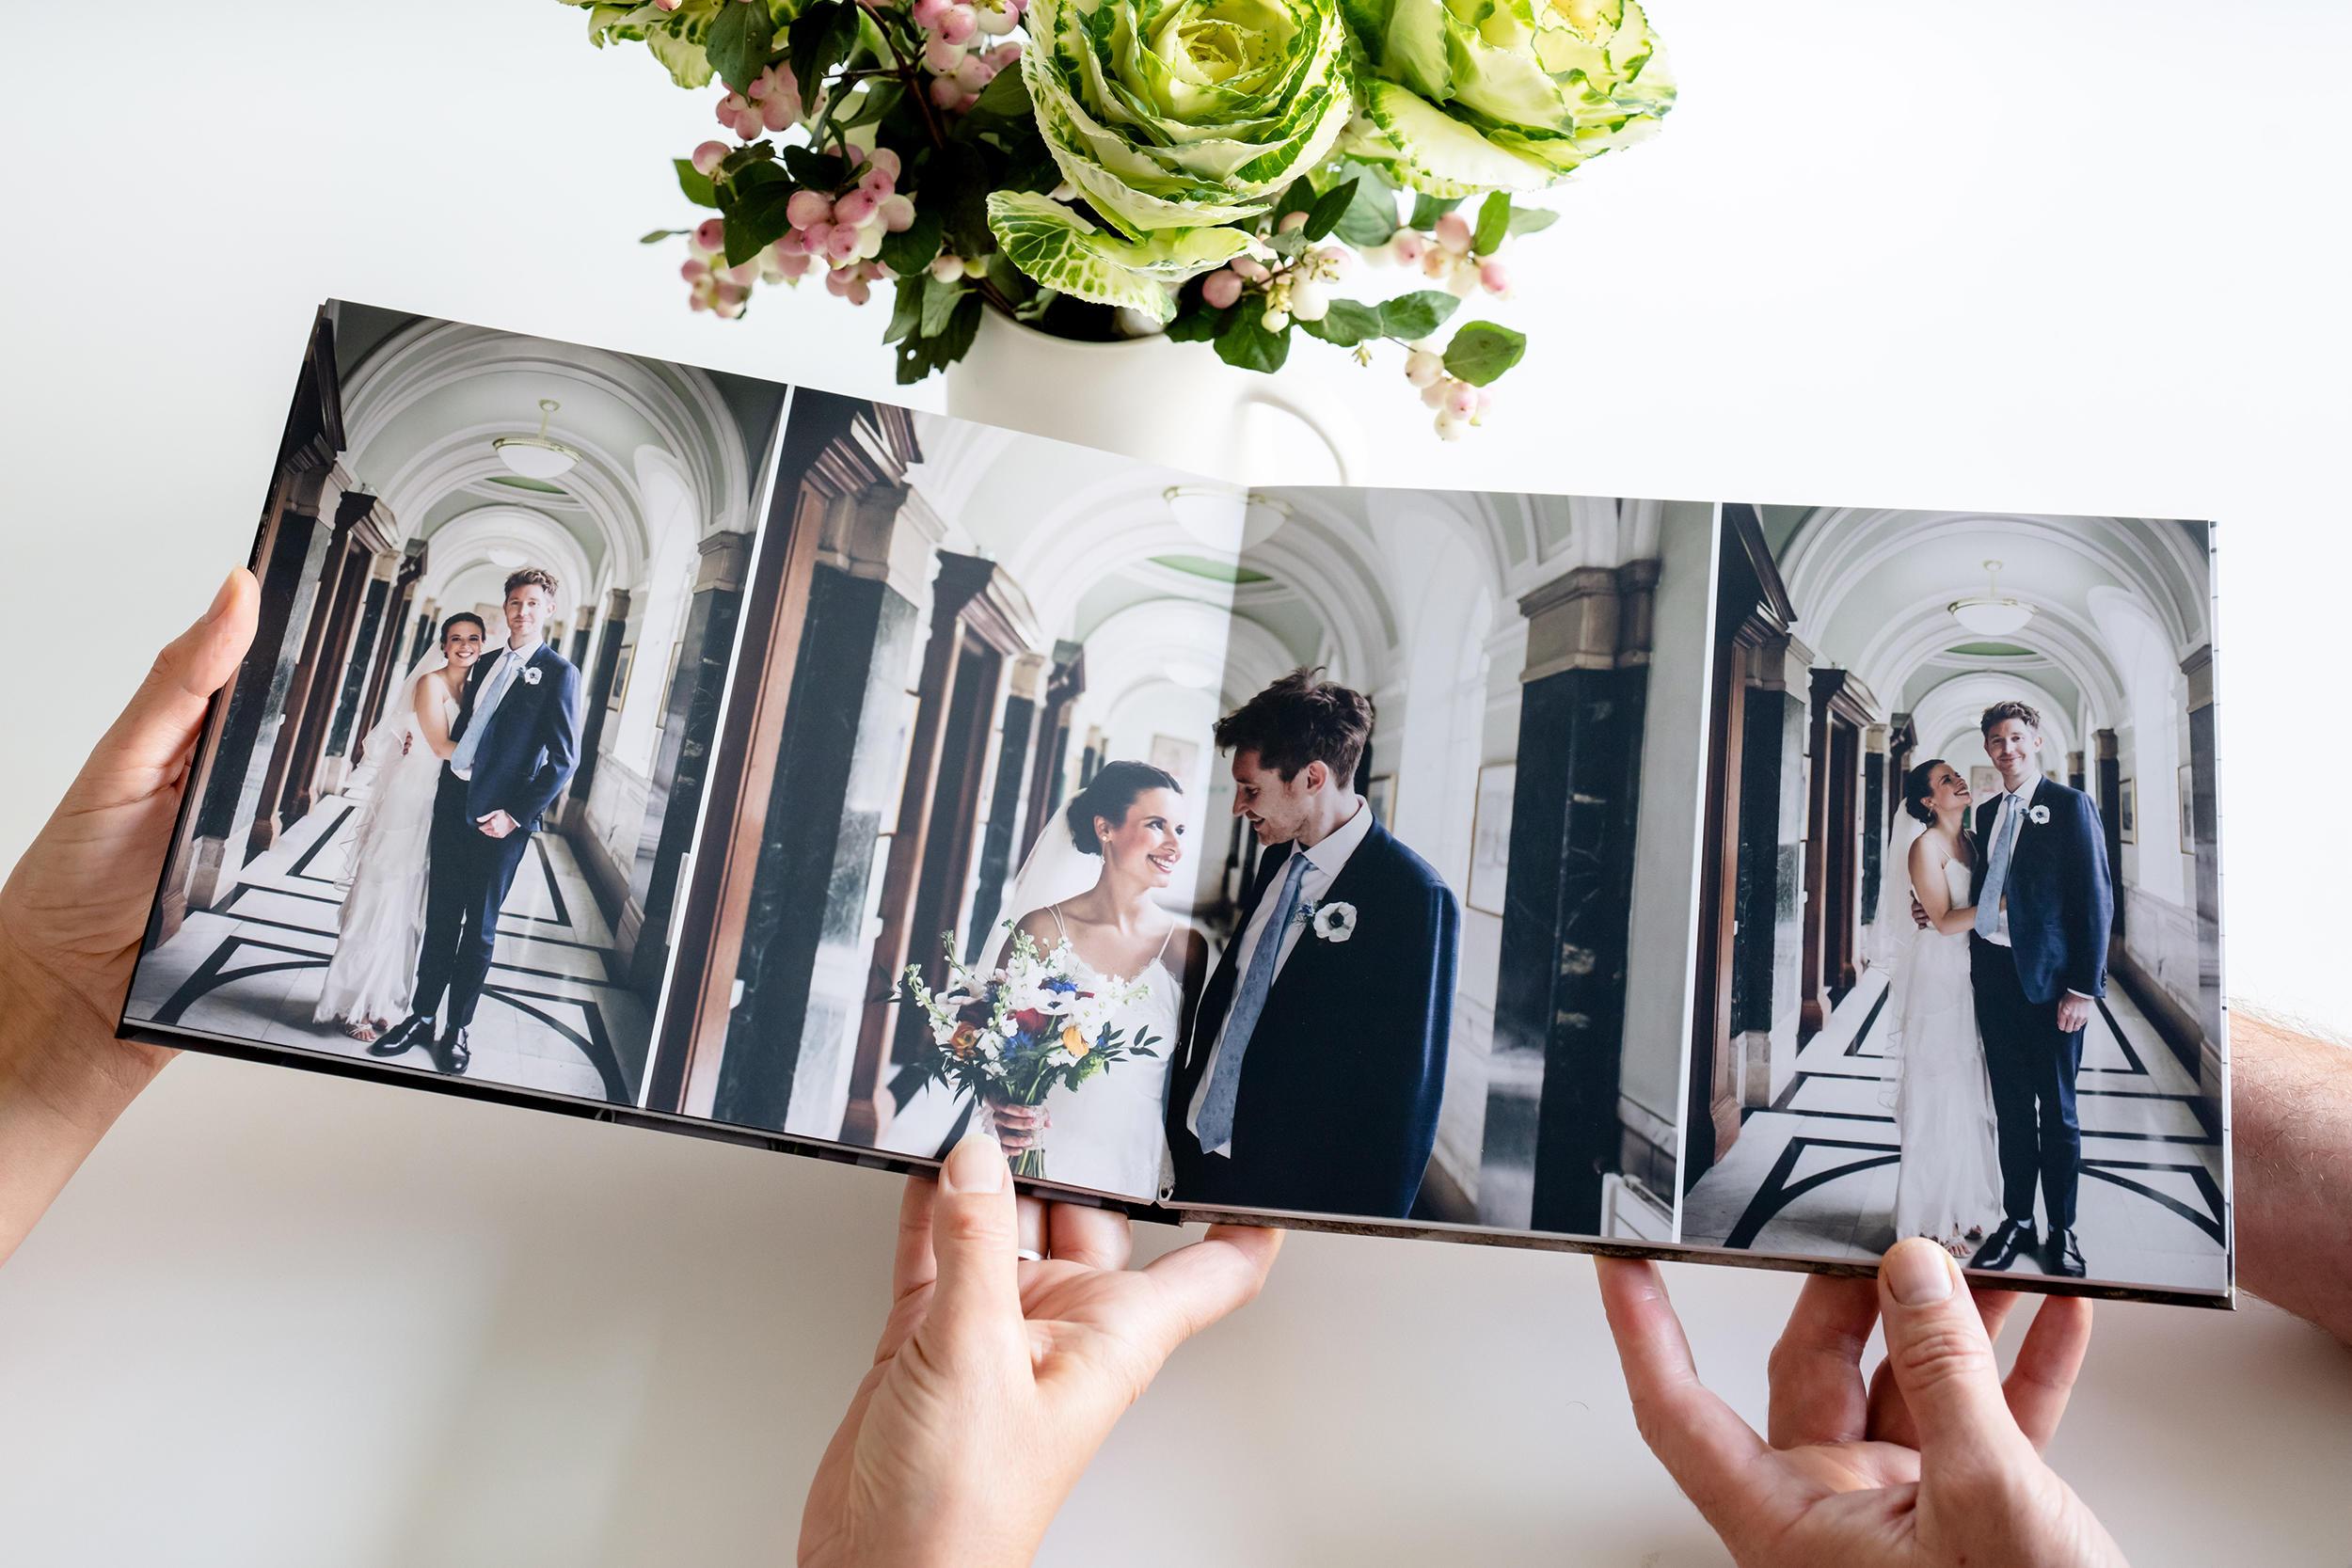 Create Wedding Albums Photo Books Bob Books